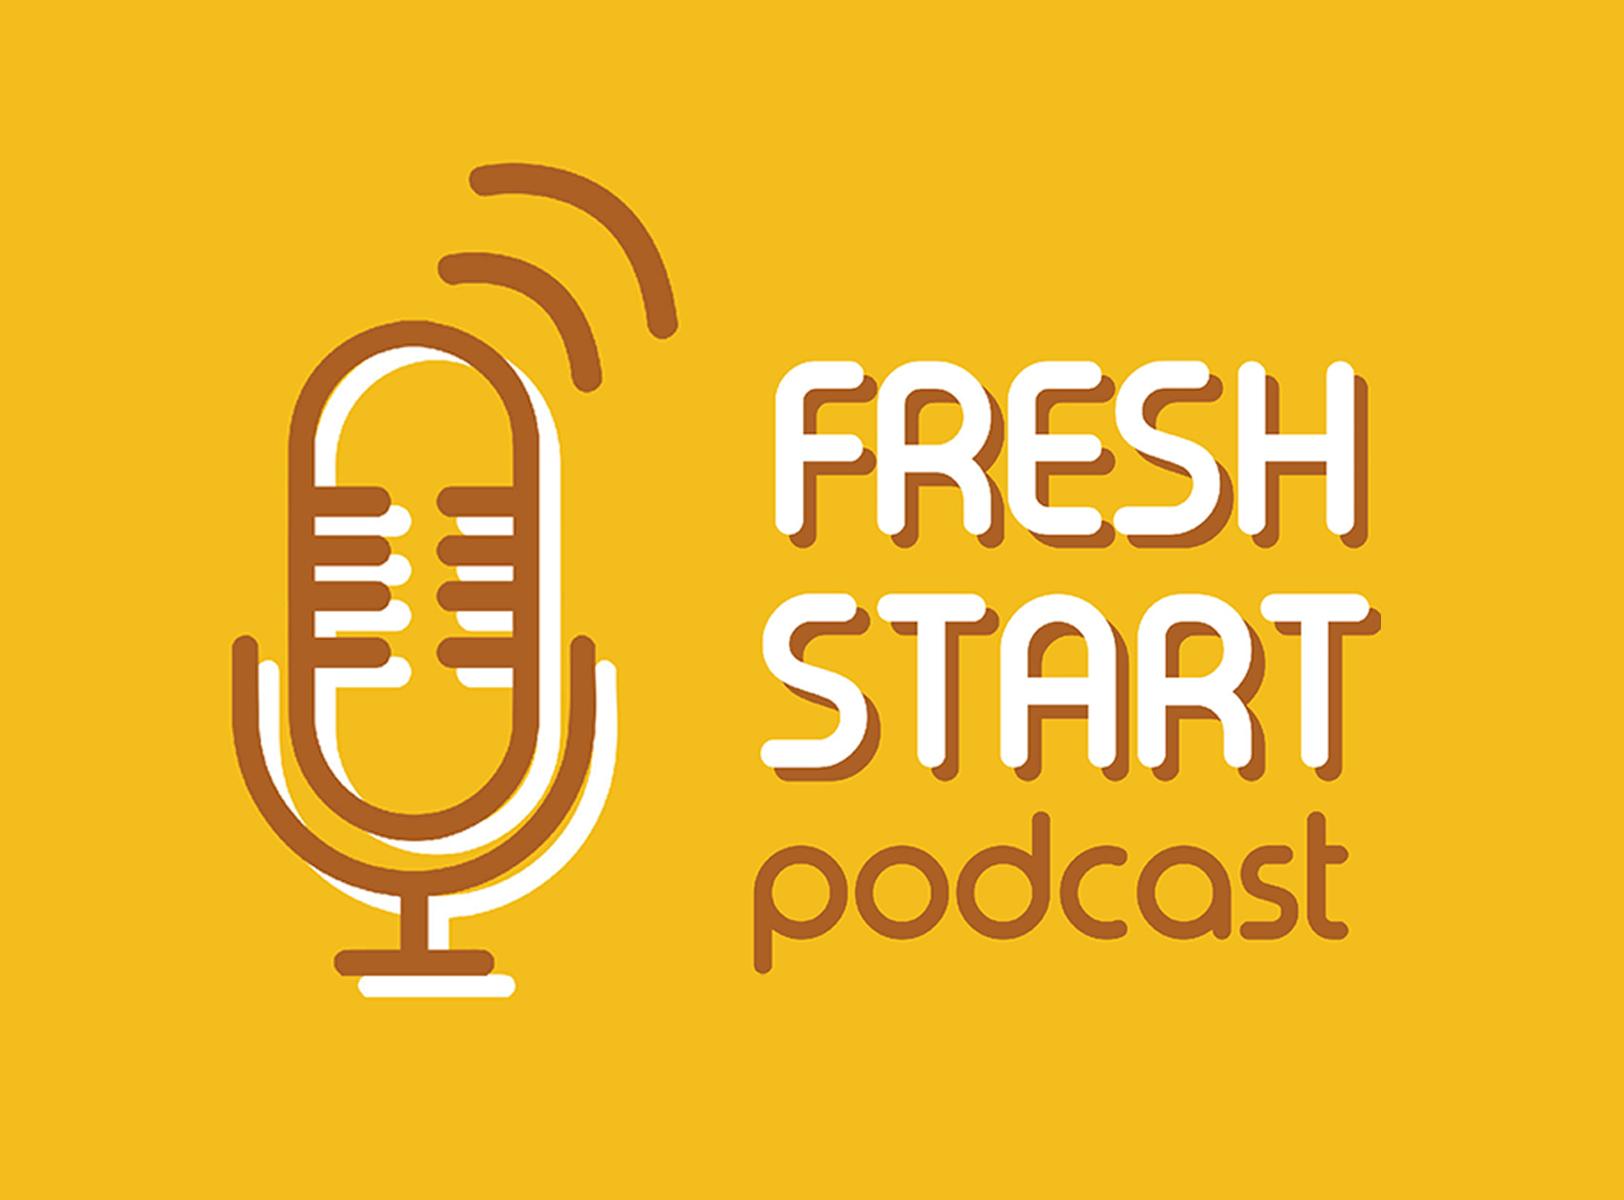 Fresh Start: Podcast News (4/7/2020 Tue.)